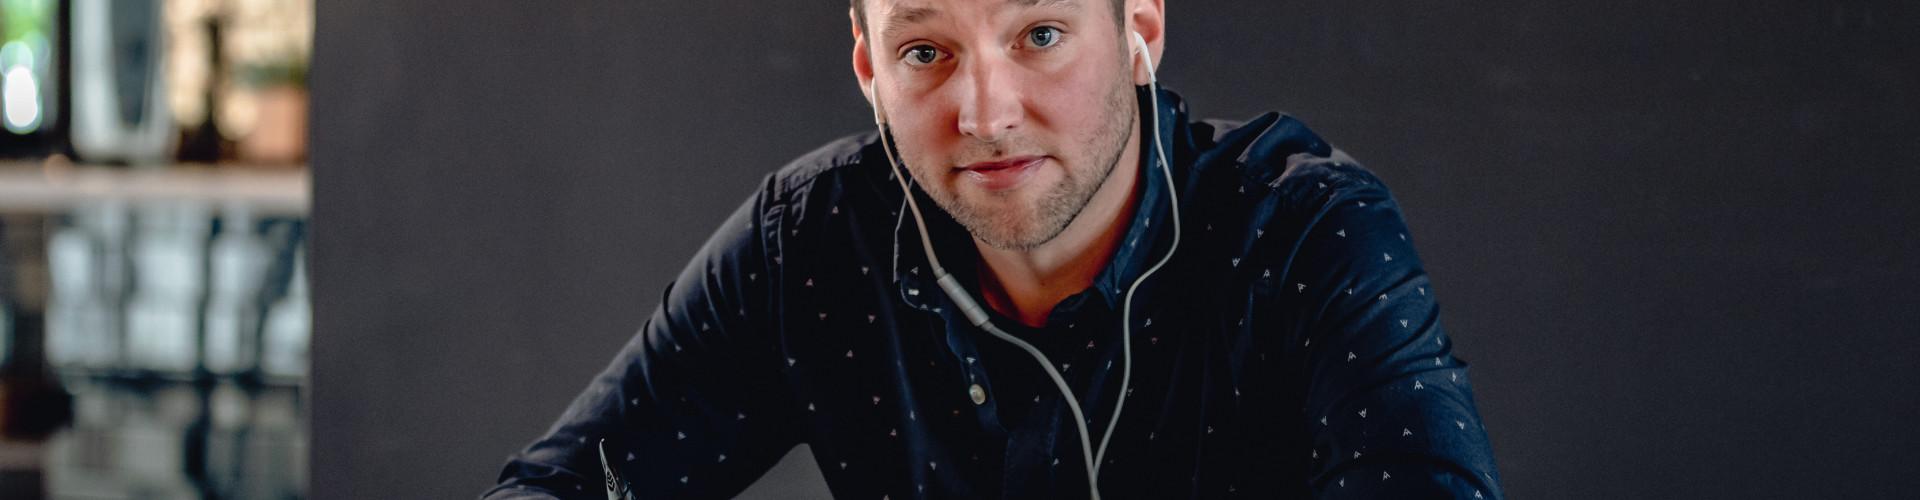 Ruben Runneboom Freelance online marketeer